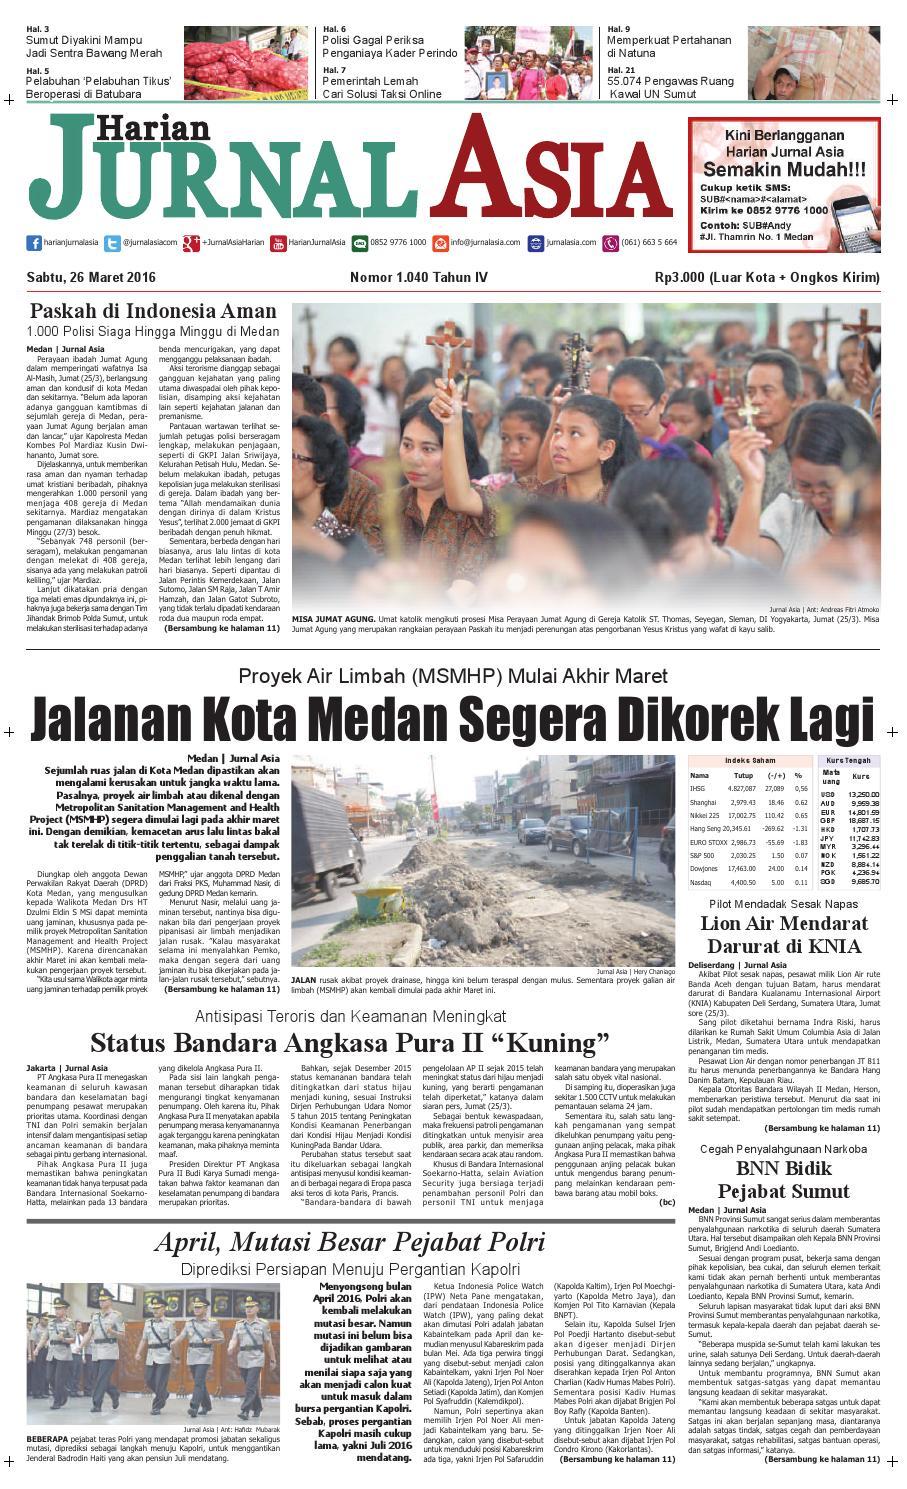 Harian Jurnal Asia Edisi Sabtu, 26 Maret 2016 by Harian Jurnal Asia - Medan - issuu